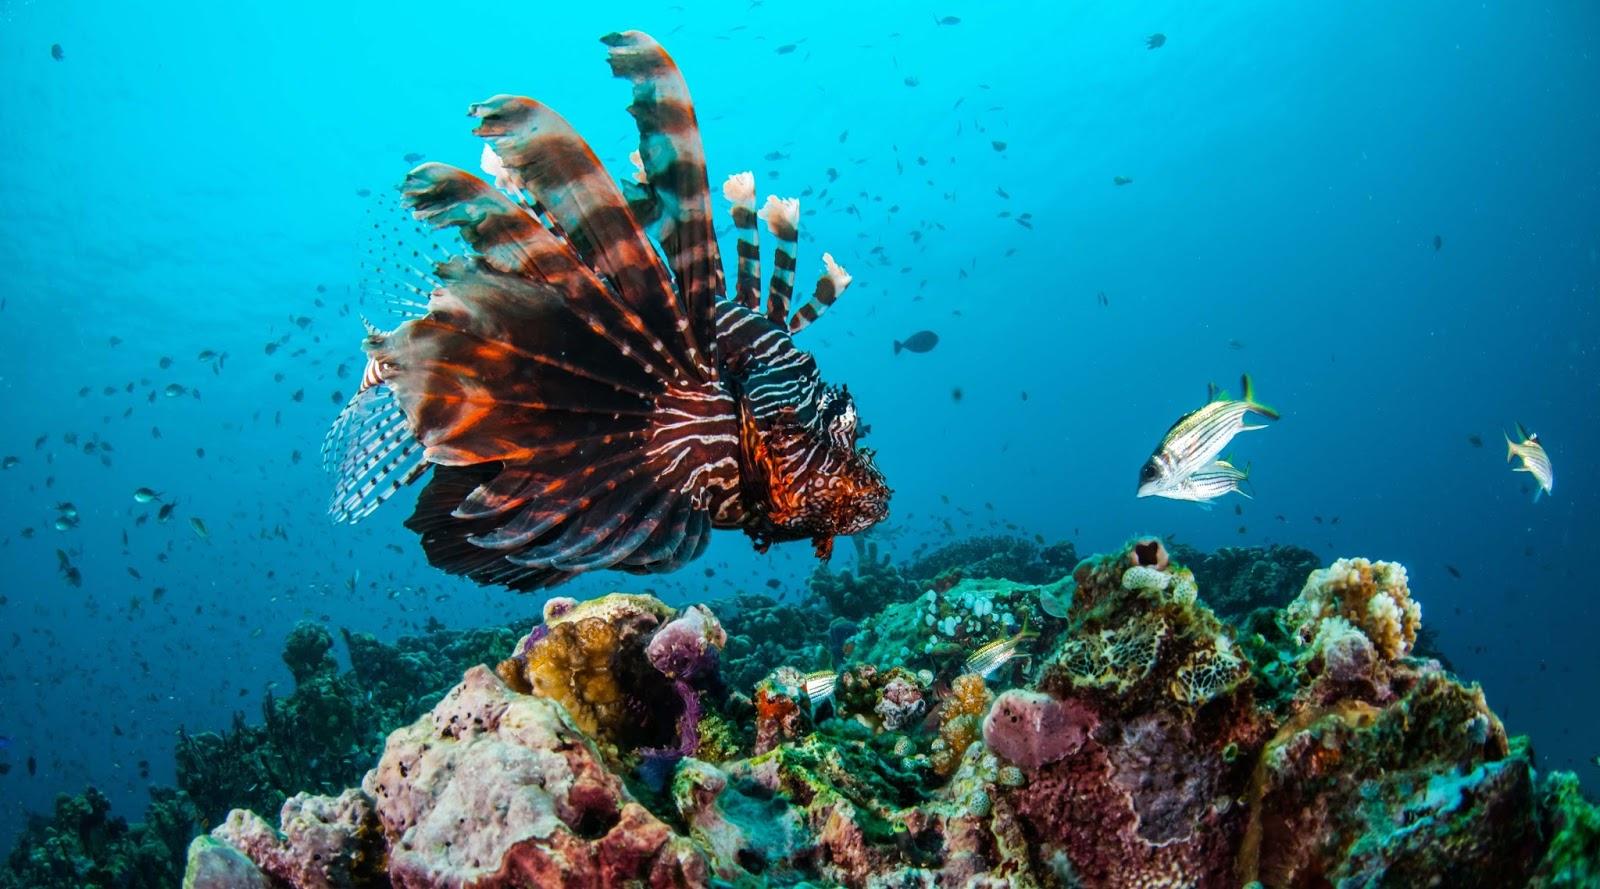 Anda akan dibuat terpesona oleh kekayaan biota laut khas pulau Moyo. Anda tidak akan menyesal selama menyelam di bawah laut Moyo. Anda akan dapat berenang bersama beranekaragam jenis ikan yang memiliki warna-warna yang cantik.